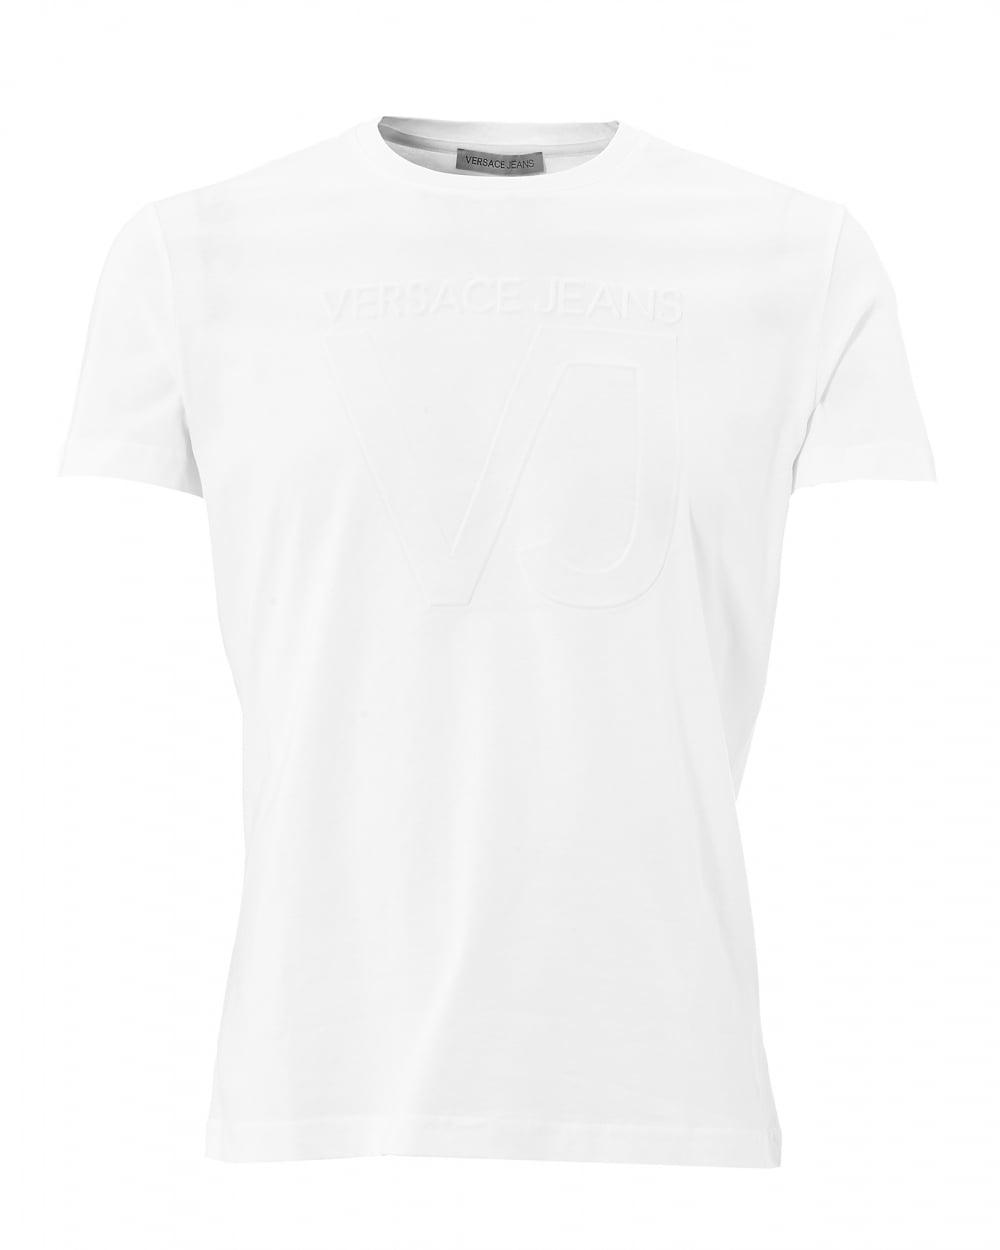 100 versace t shirts for men versace t shirt damen. Black Bedroom Furniture Sets. Home Design Ideas